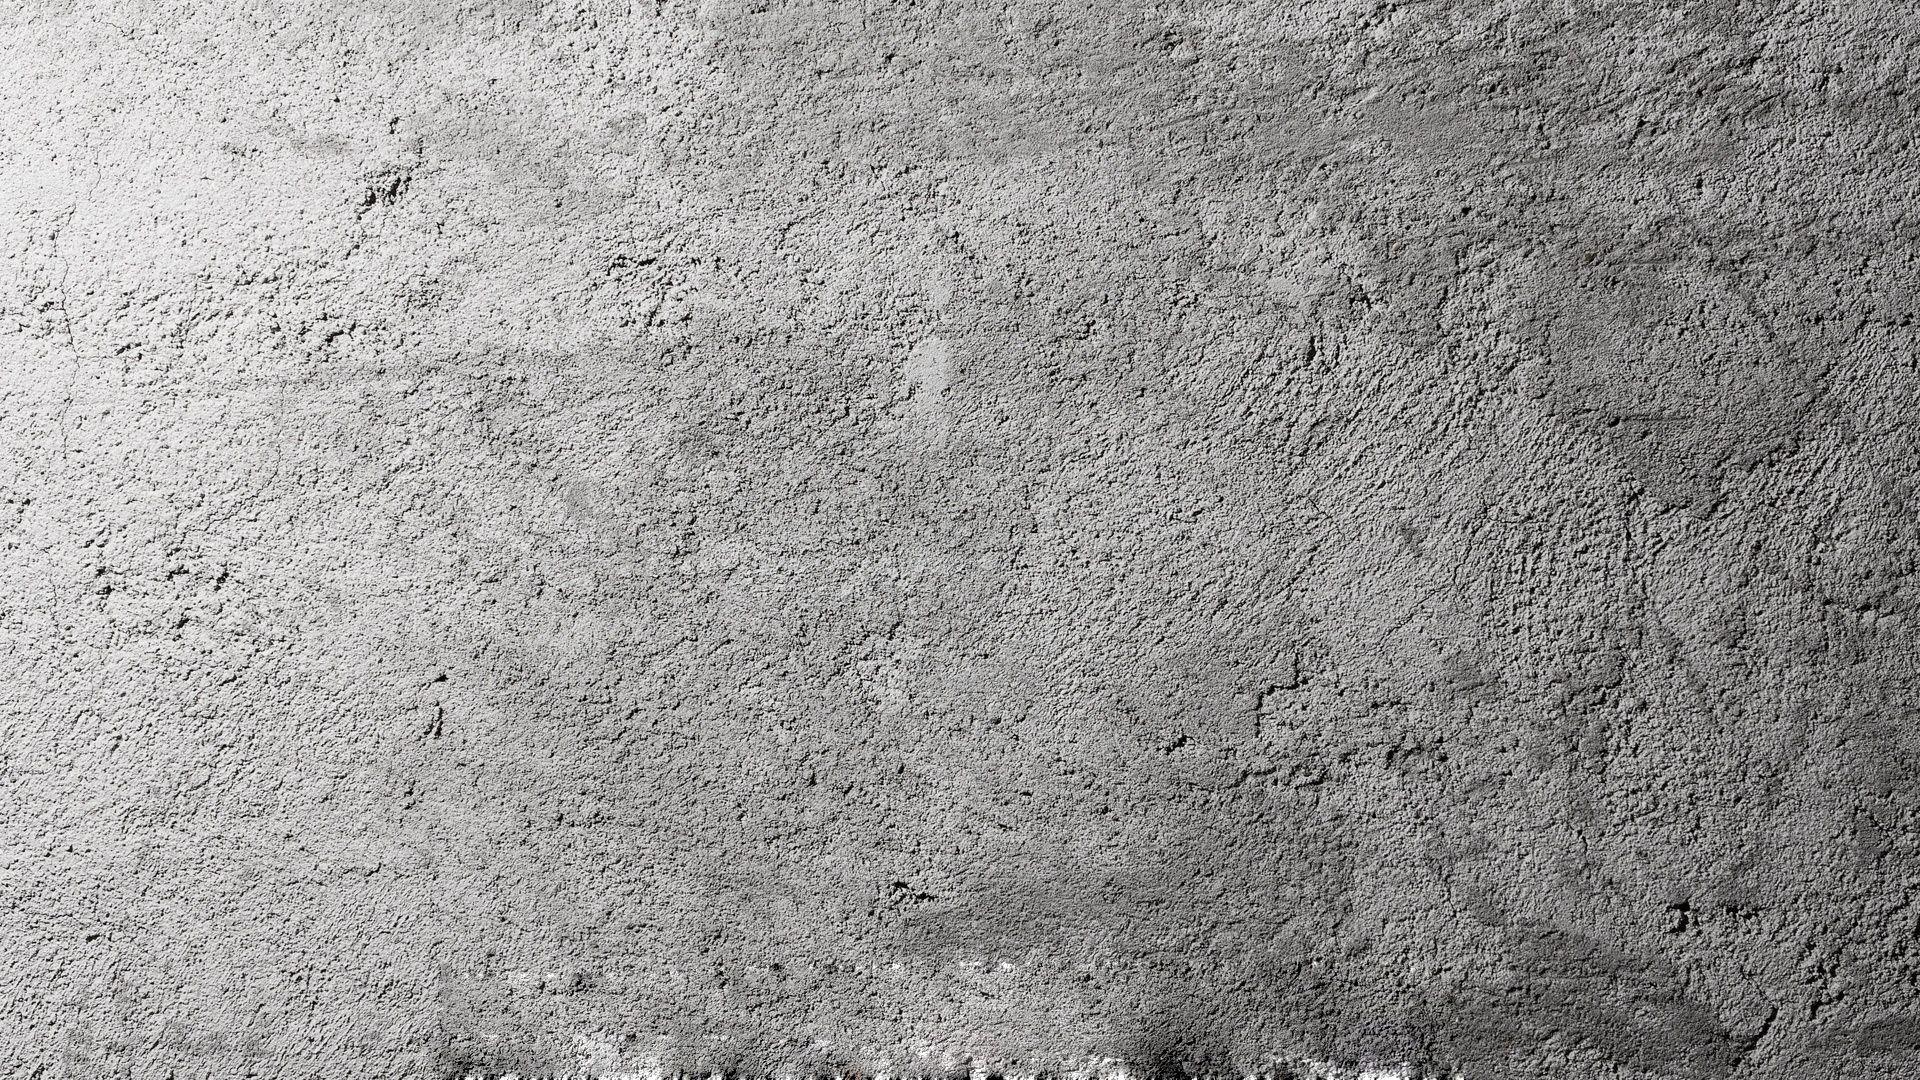 Free Cement Wallpaper Hd Desain Ide